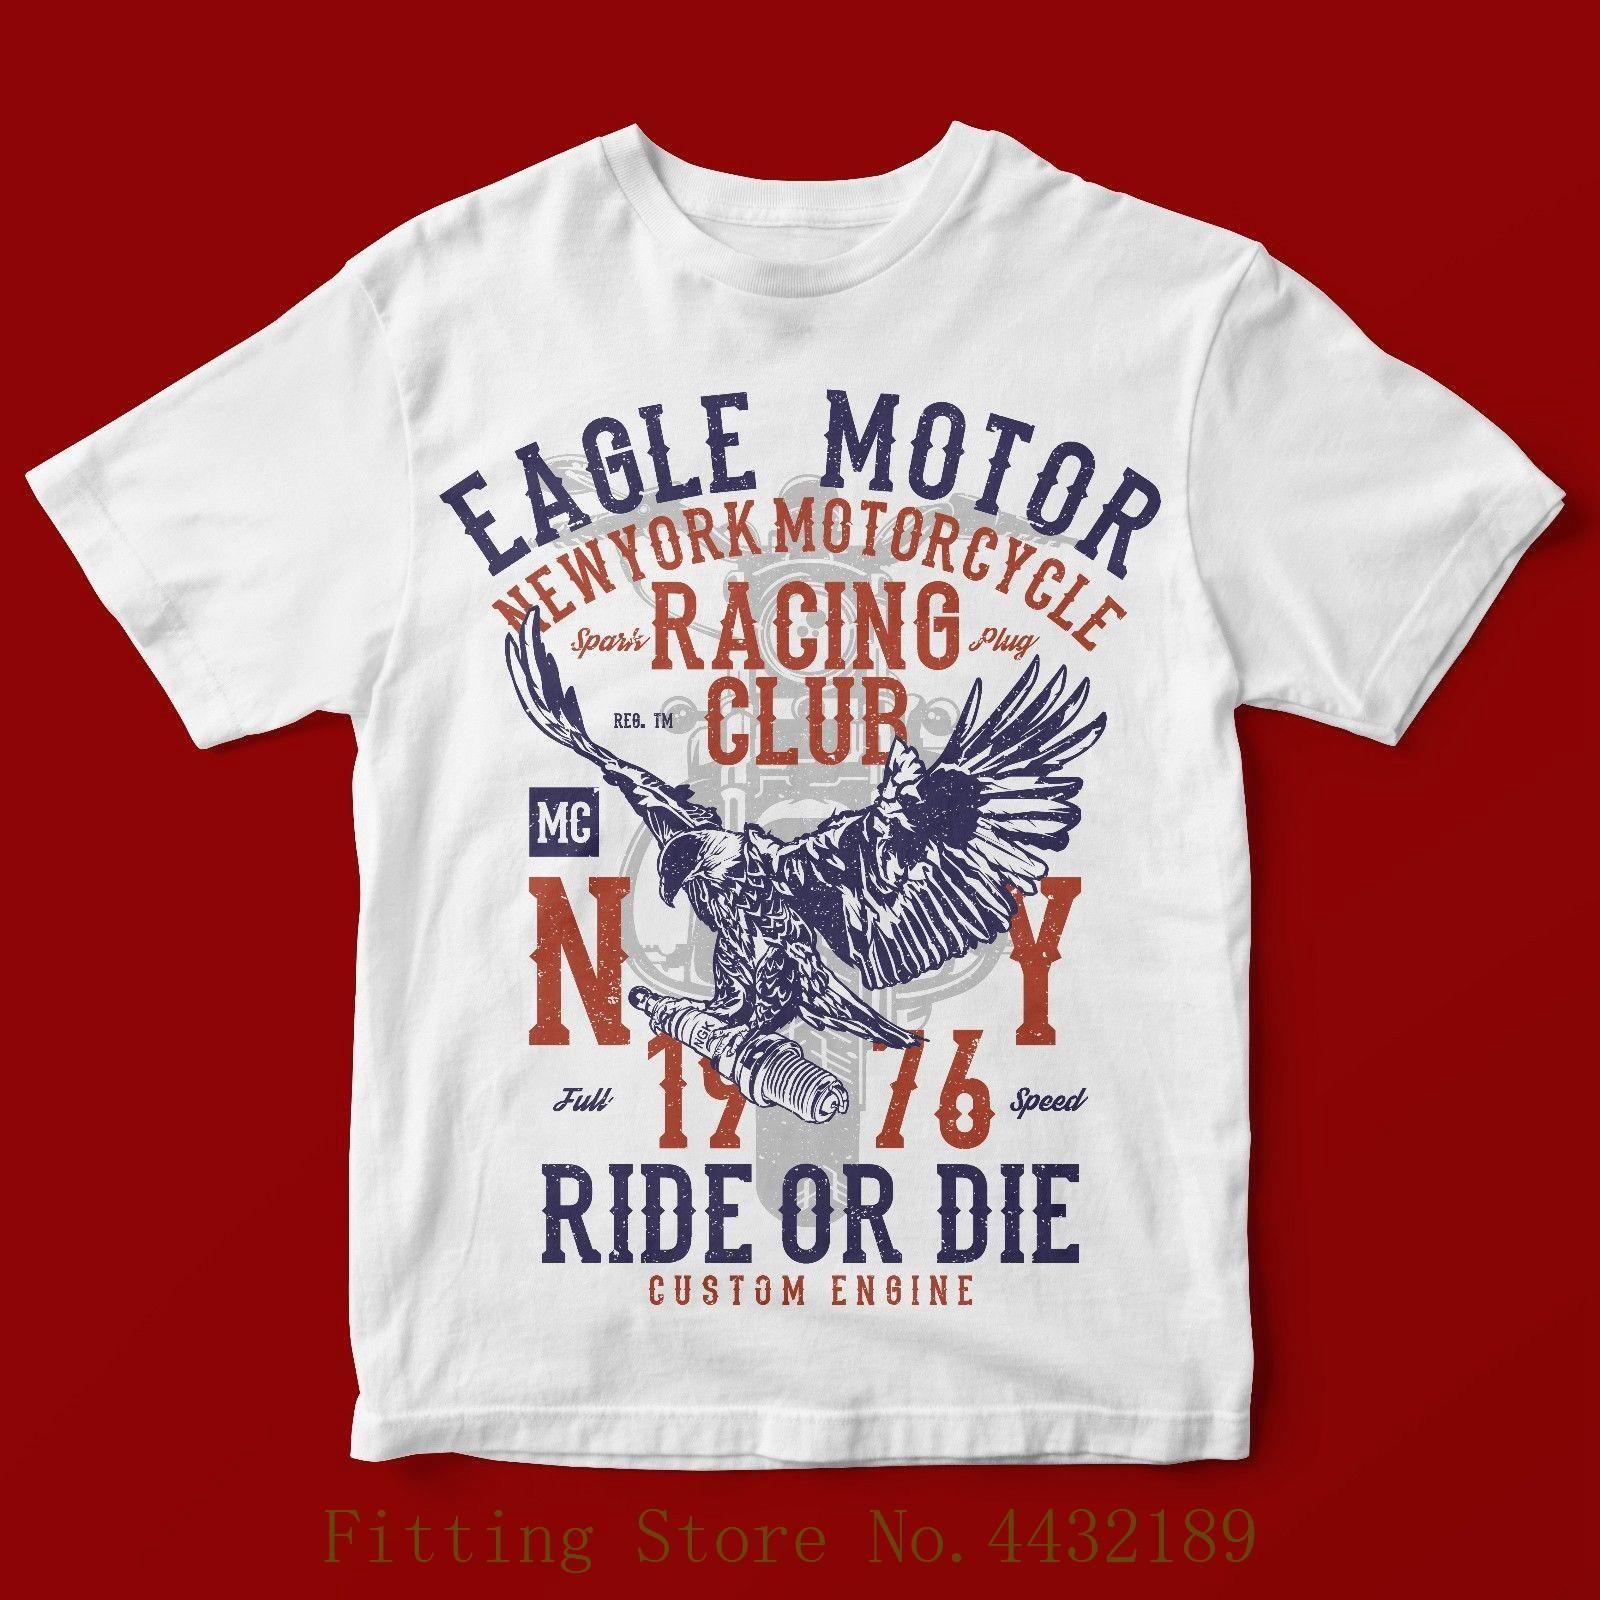 9c3df5a9 Online T Shirt Printing - DREAMWORKS